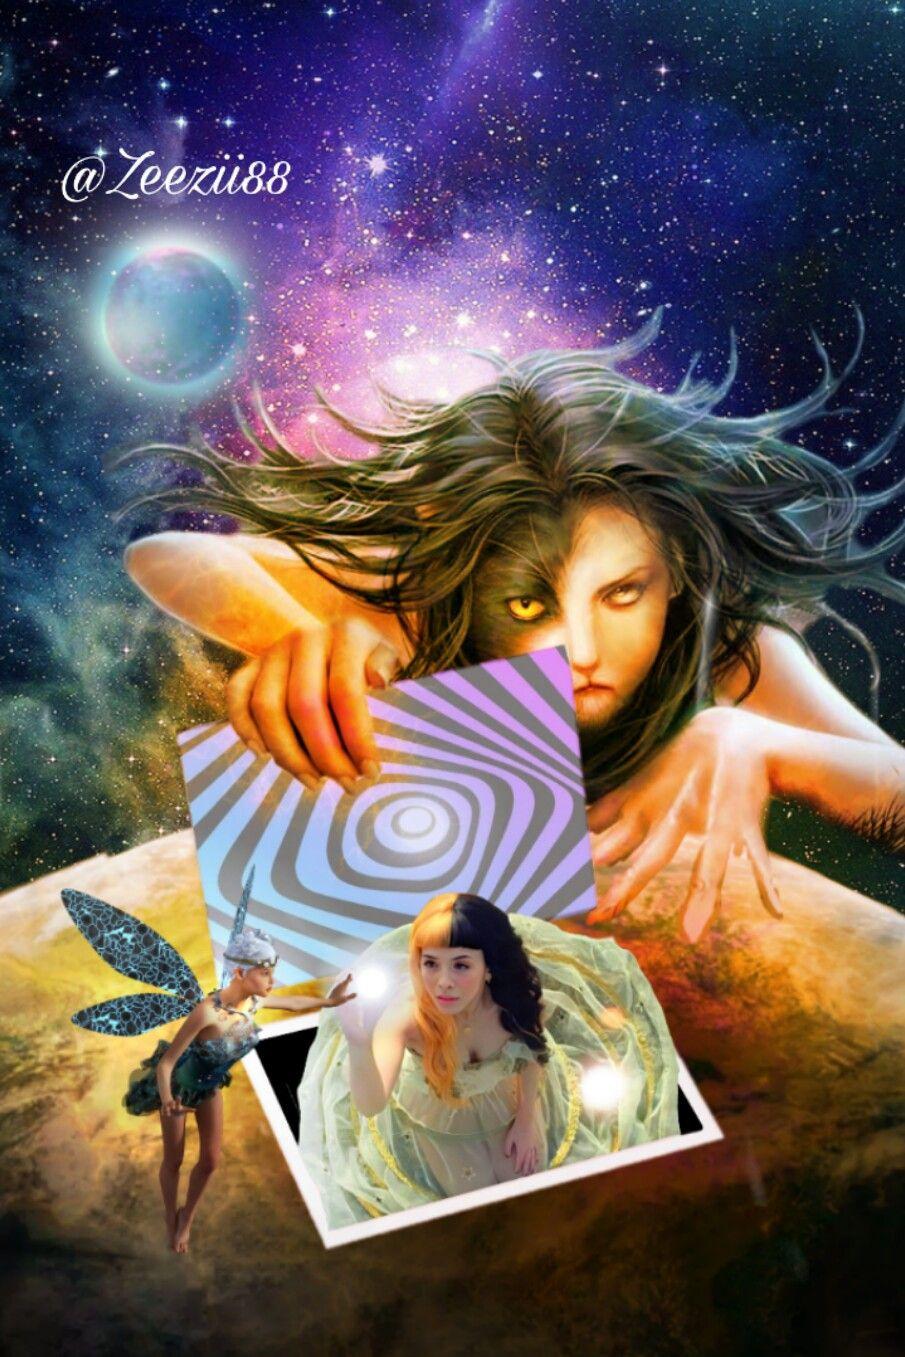 🍃🌼🌹🍀 #freetoedit #zeezii88 @zeezii88 #fantasia #galaxy  #ircpeachquartz #peachquartz